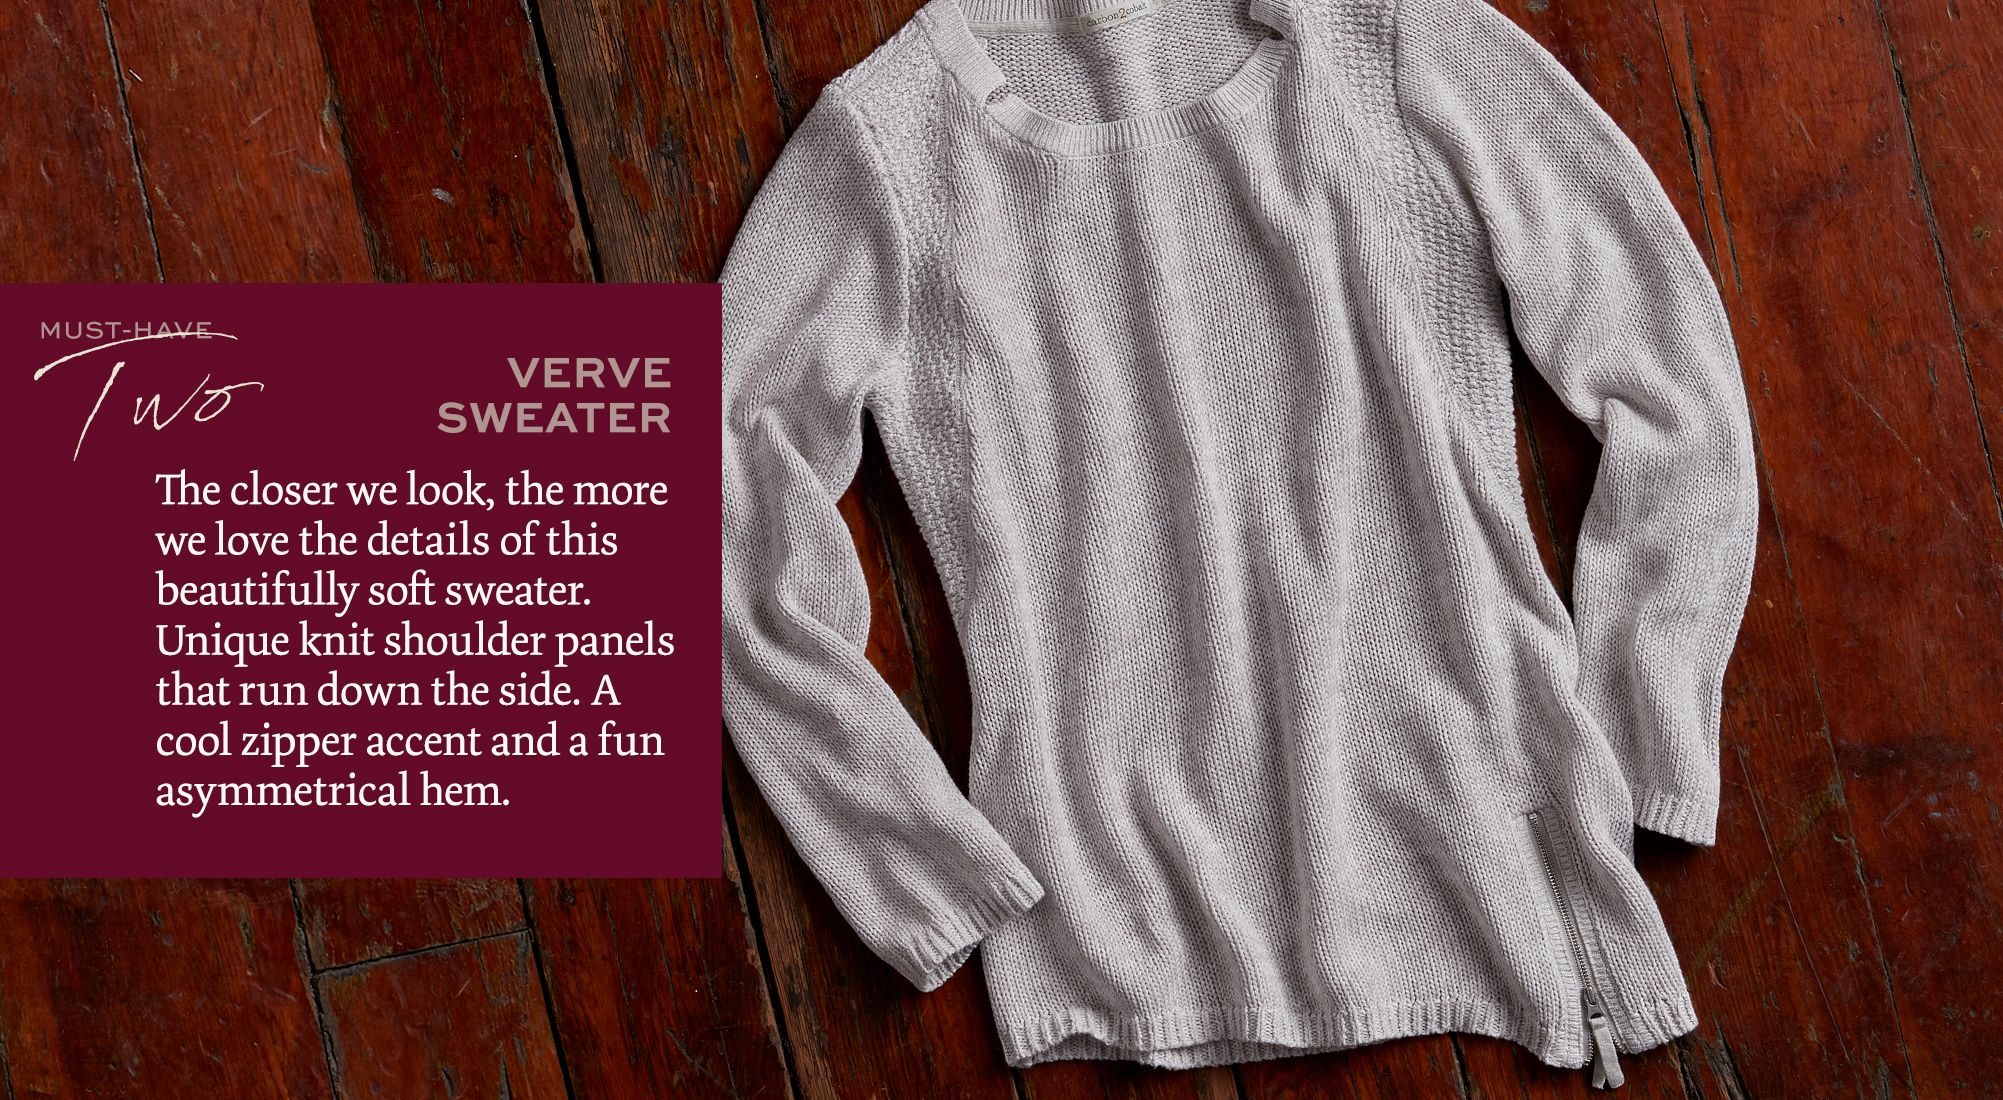 Verve Sweater